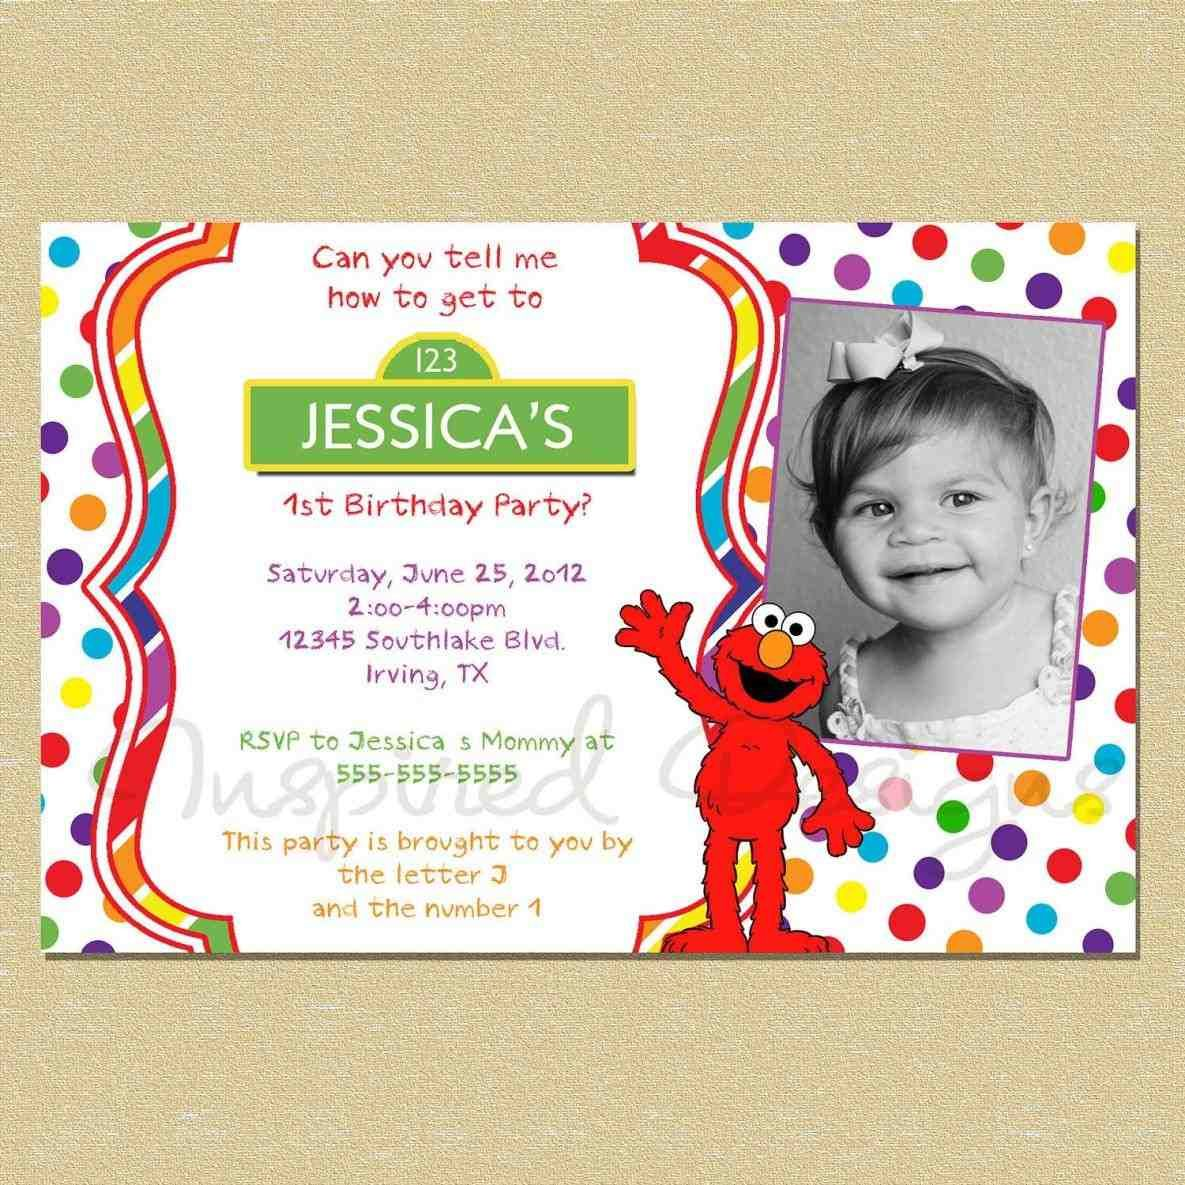 boarding pass wedding invitation. mickey mouse invitations love to ...